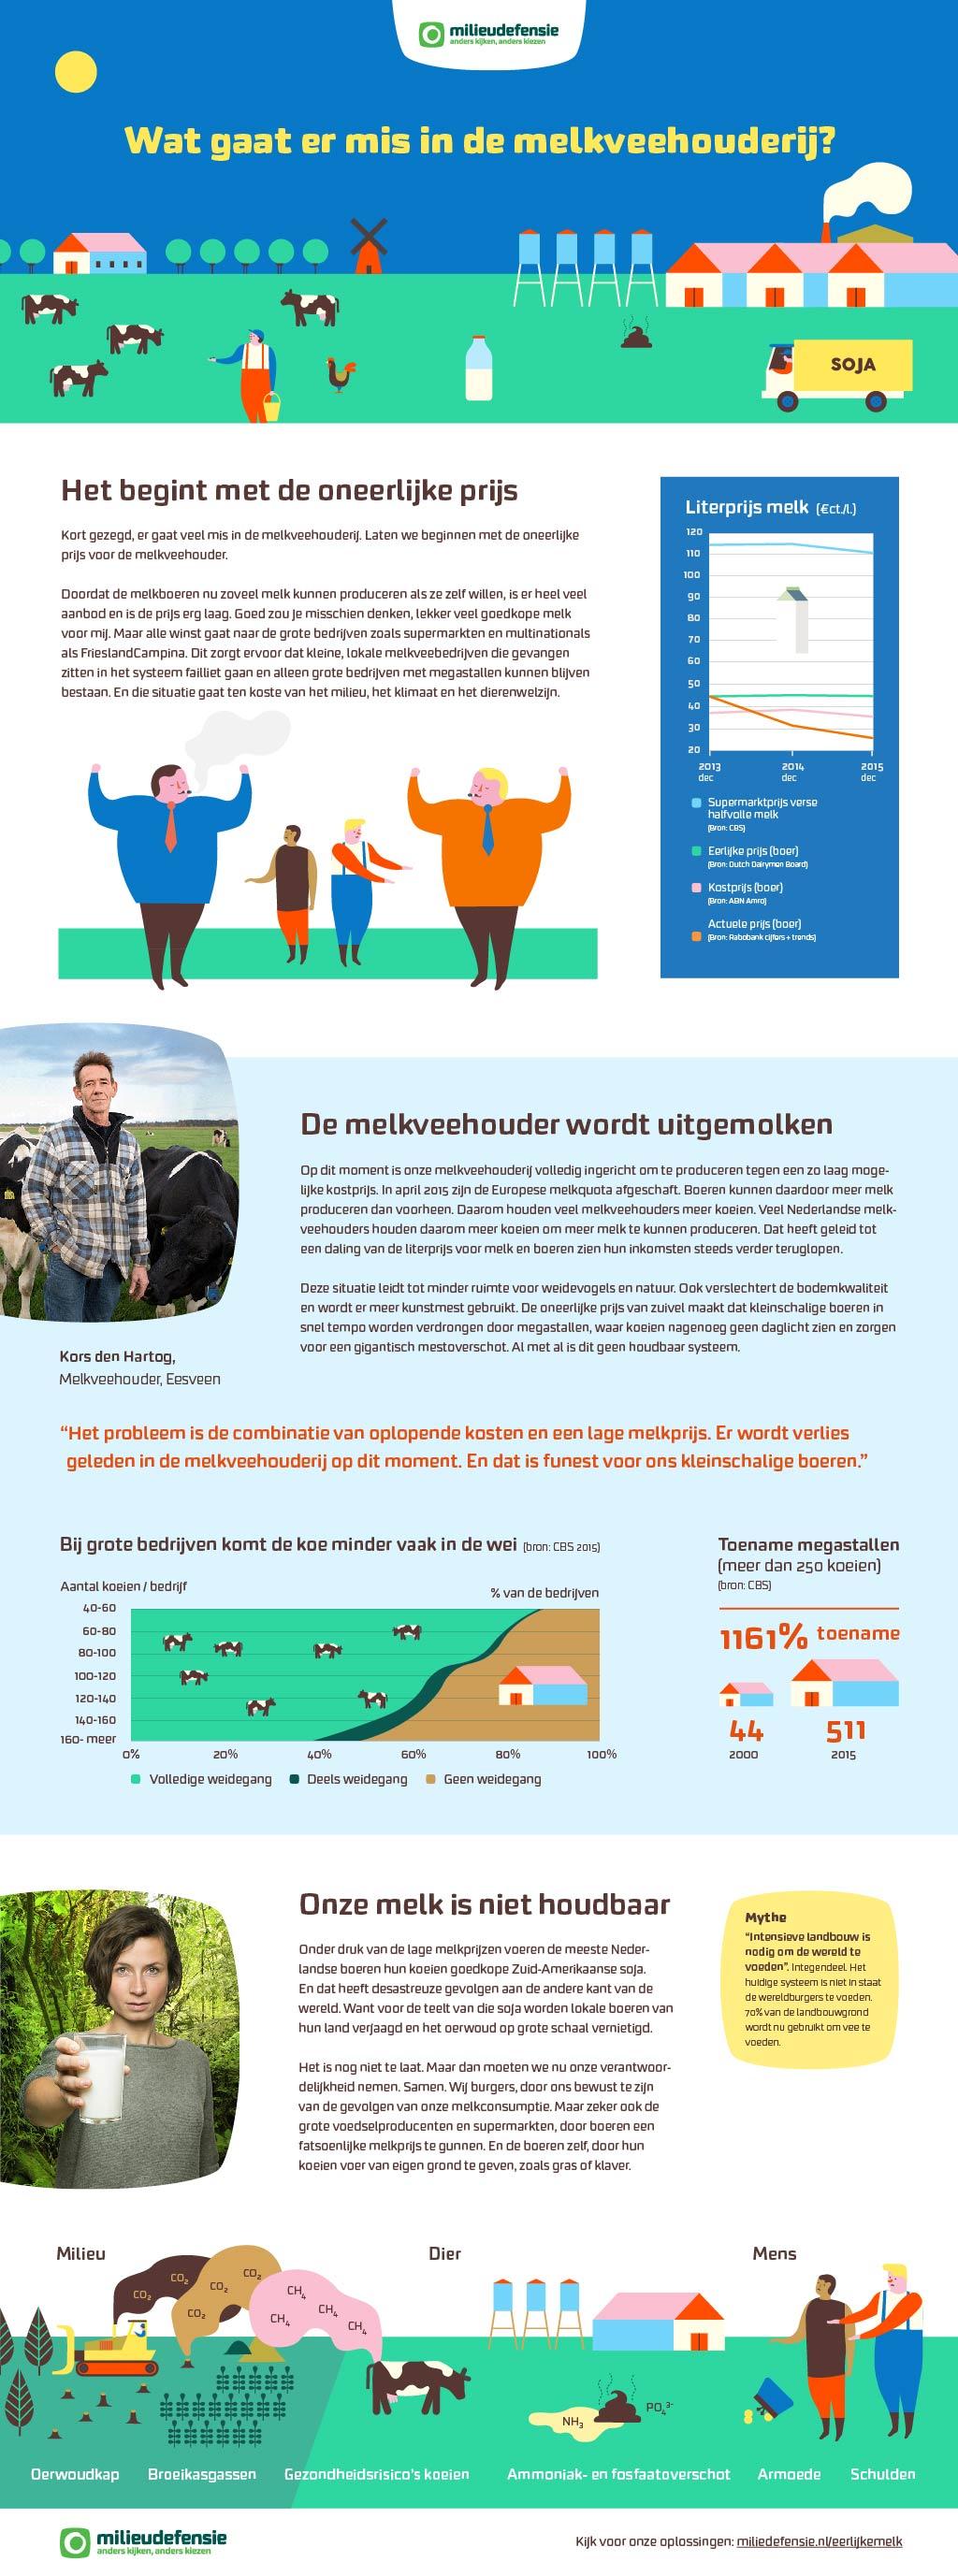 Milieudefensie-infographic-melk-act-impact-02